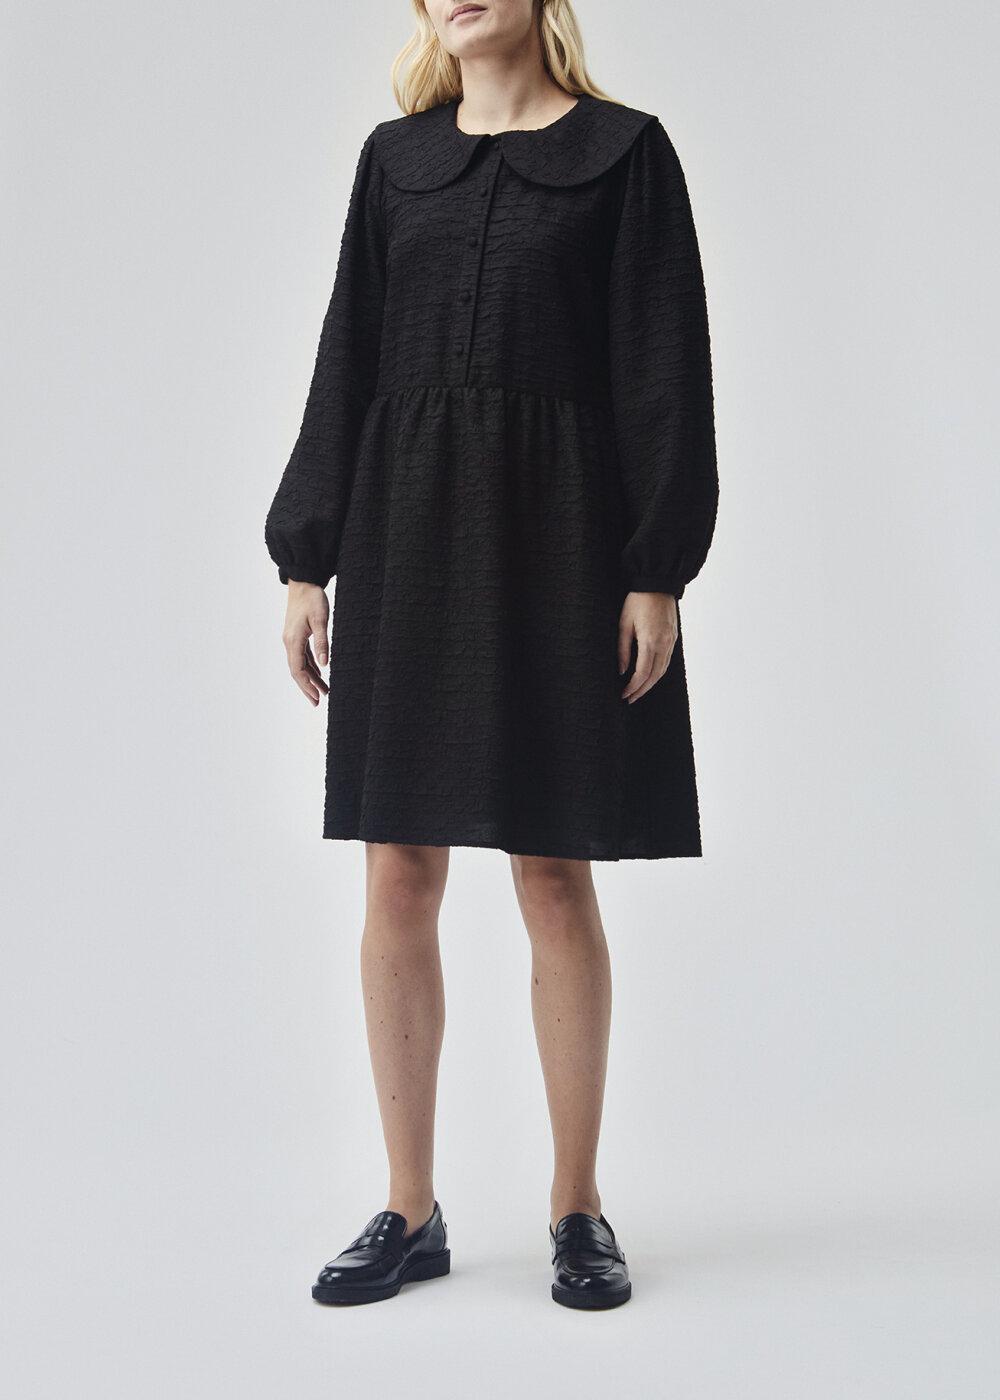 Modström Hazell kjole, black, medium